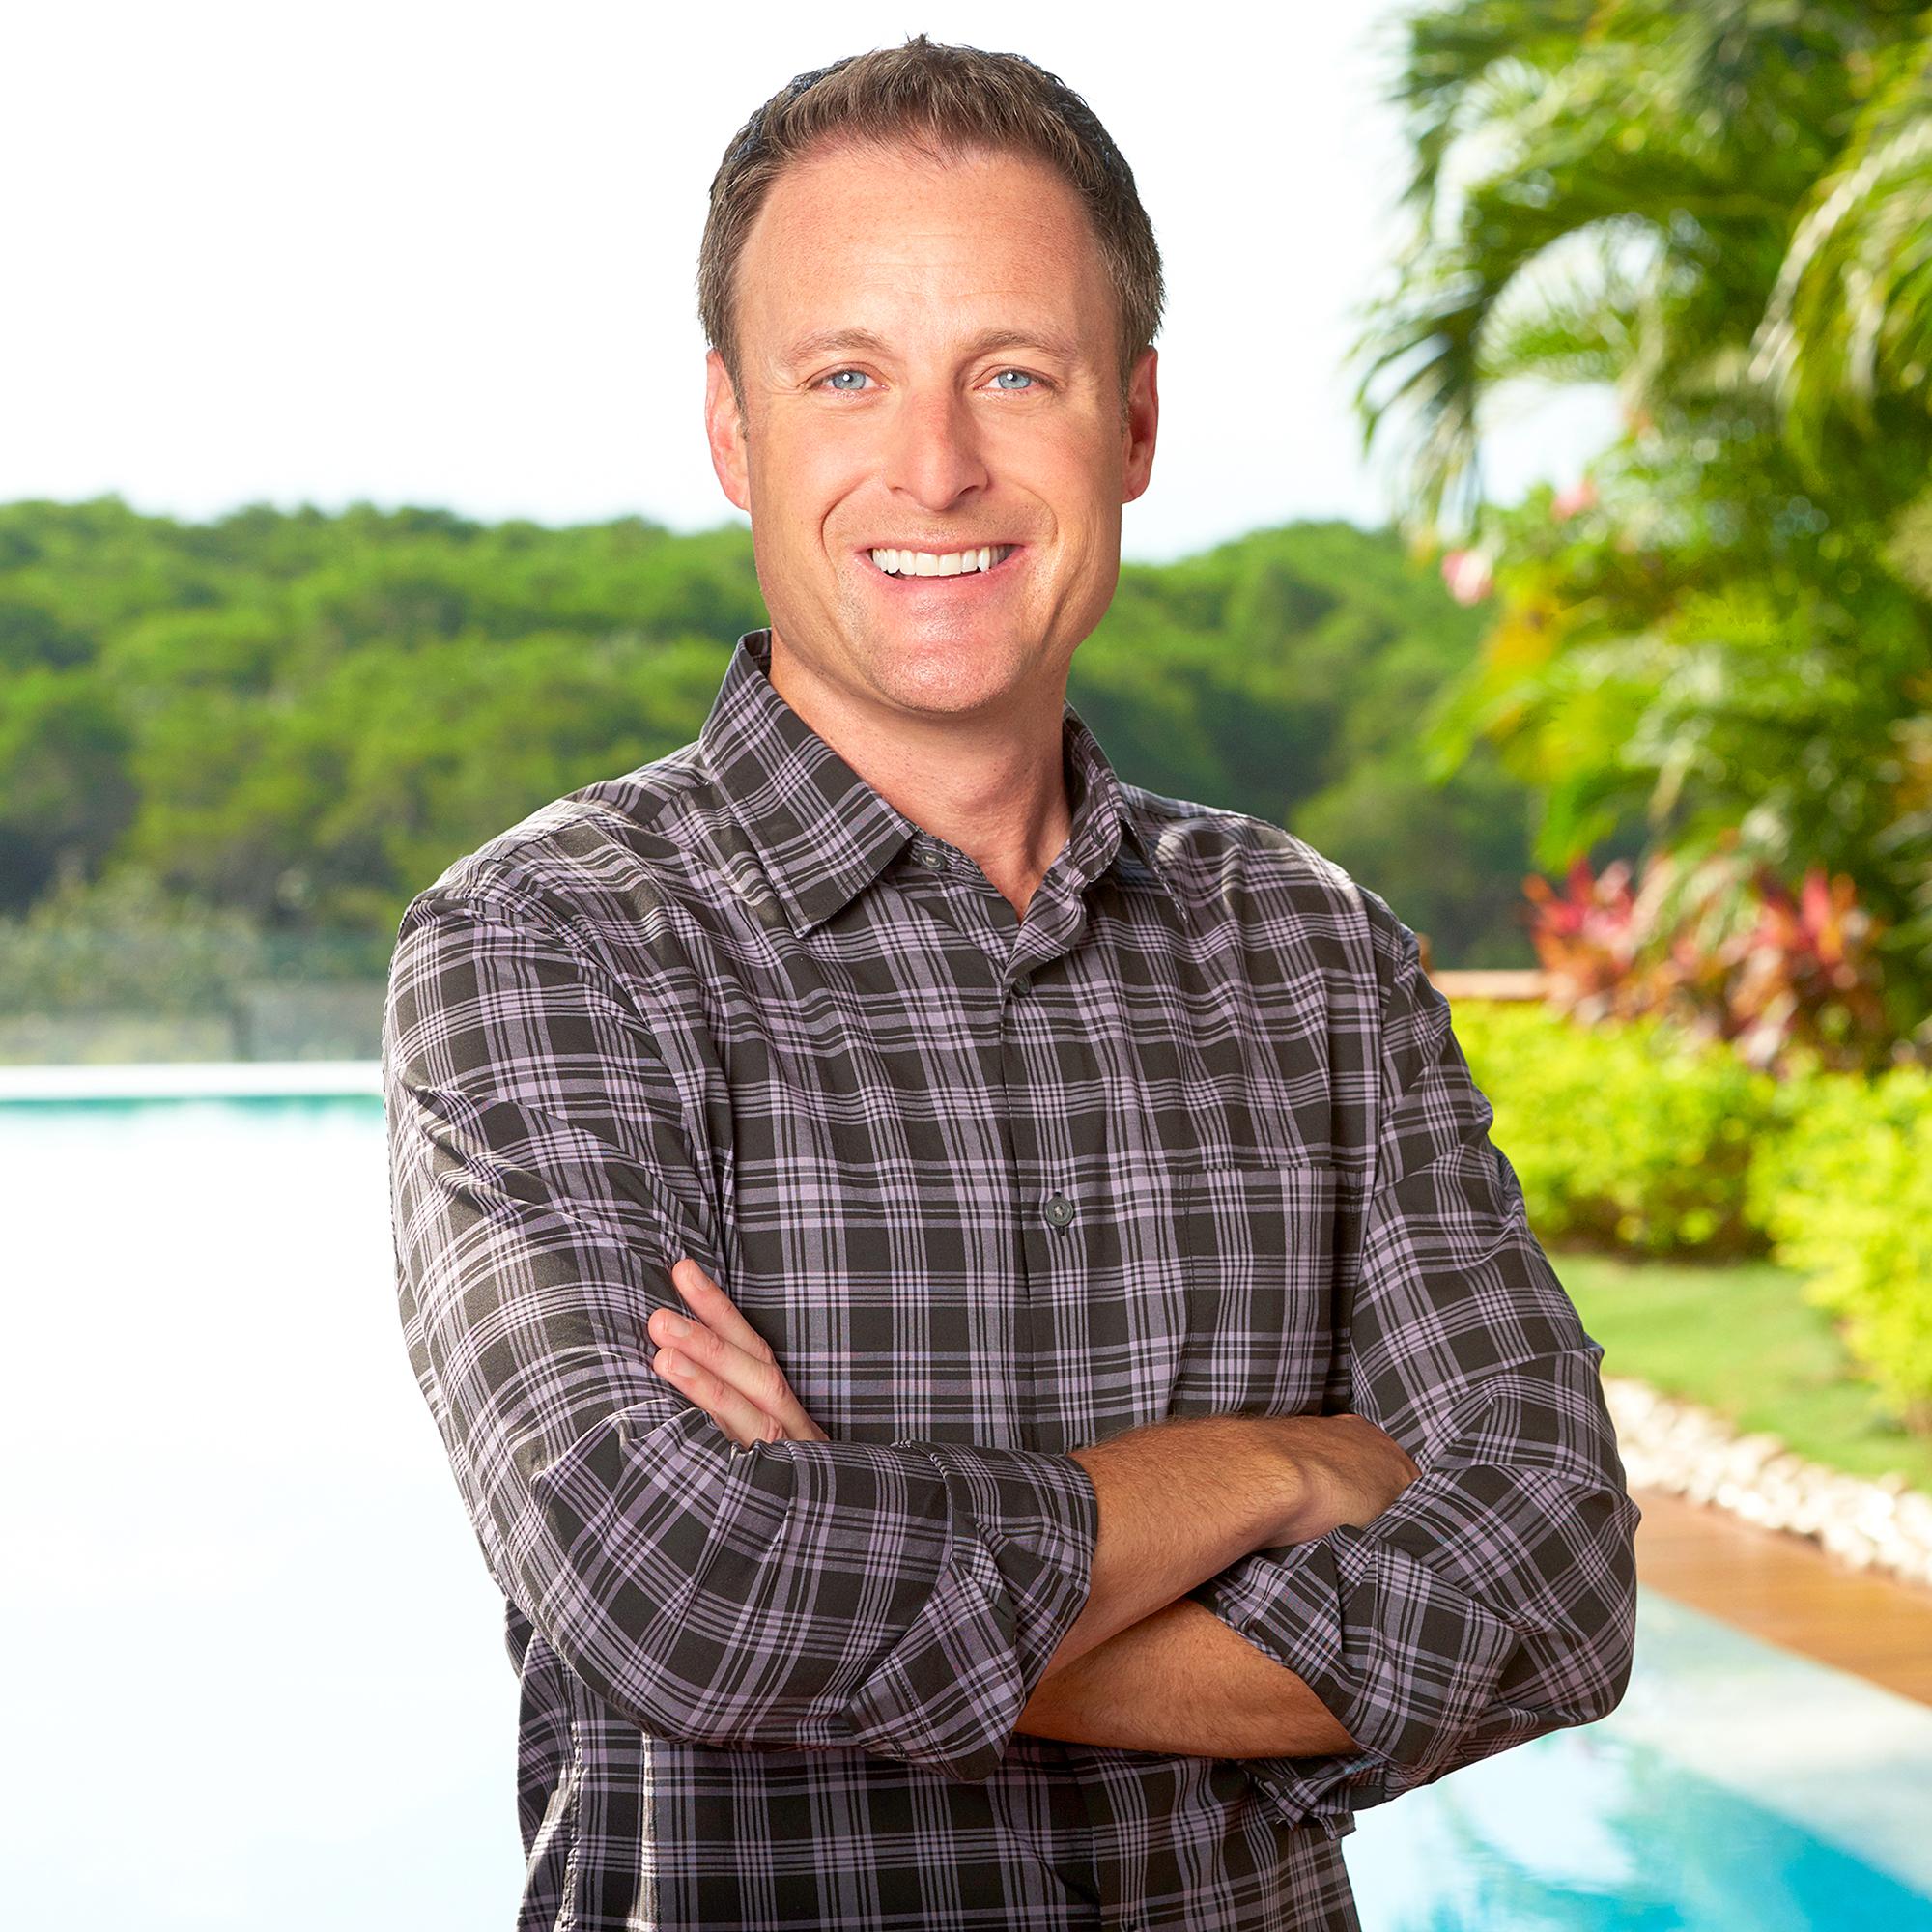 Chris Harrison Bachelor in Paradise